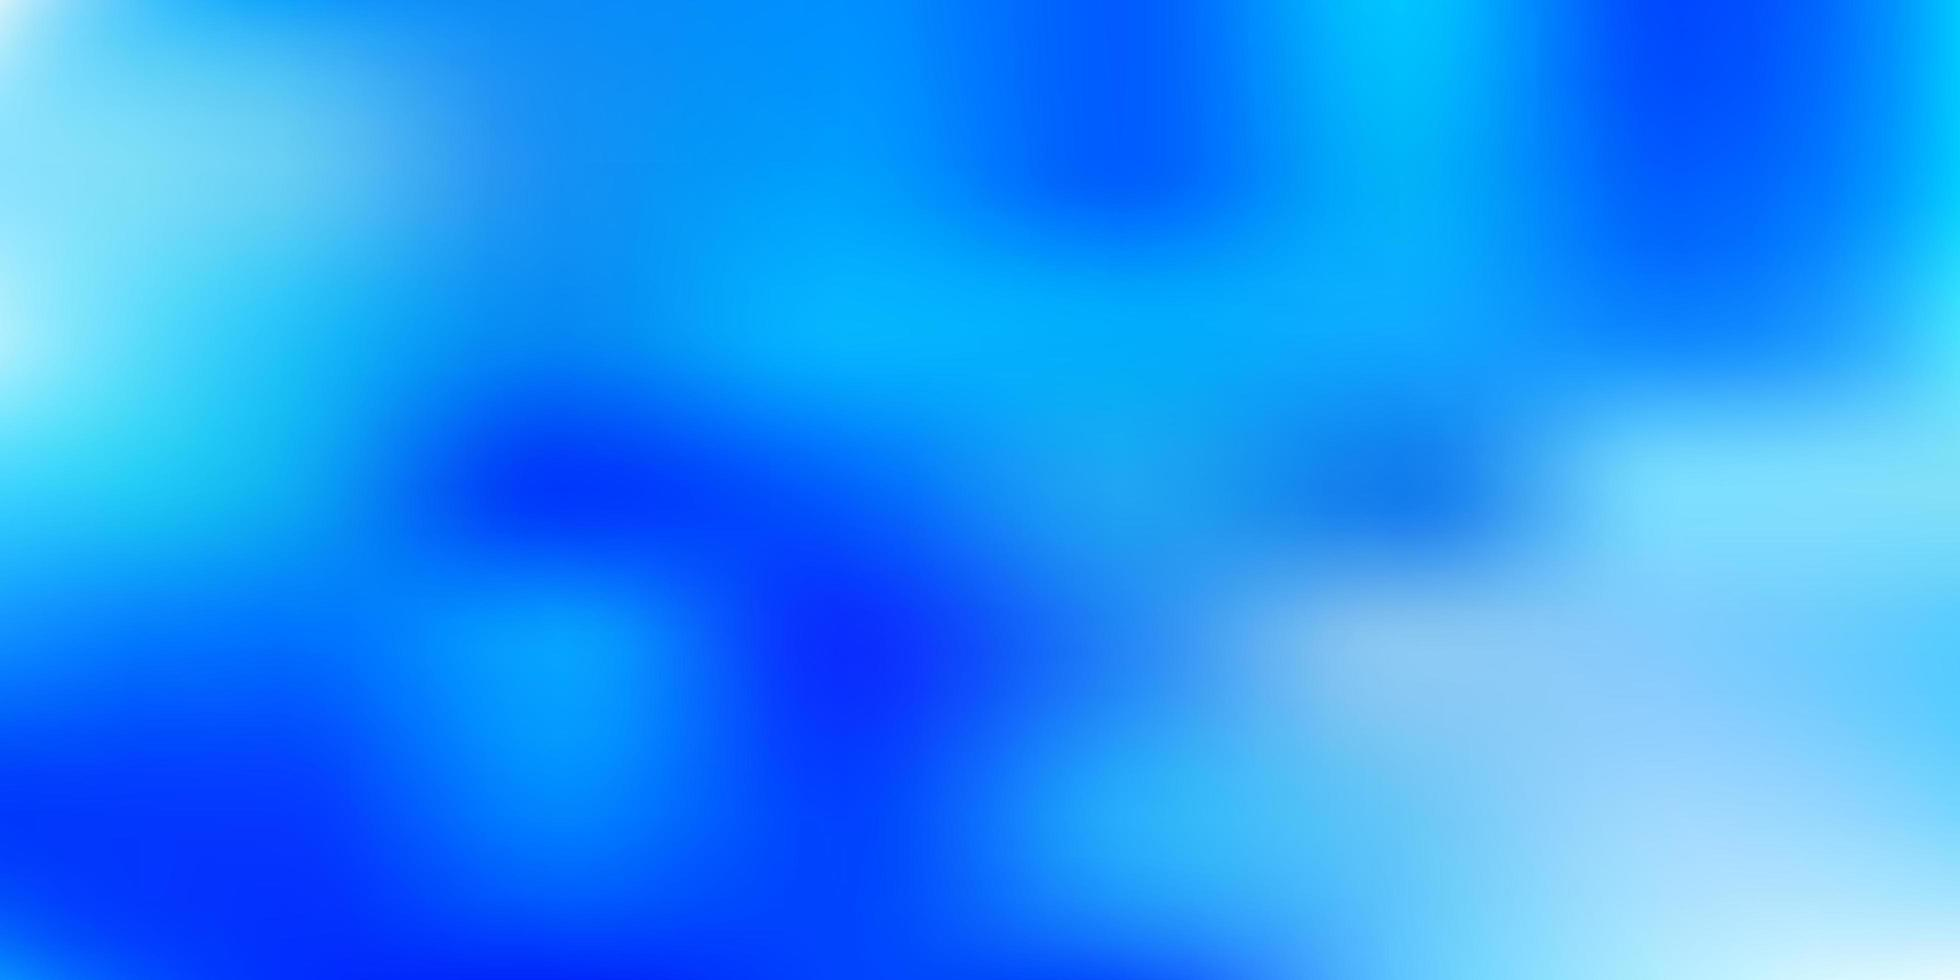 patrón de desenfoque degradado de vector azul claro.